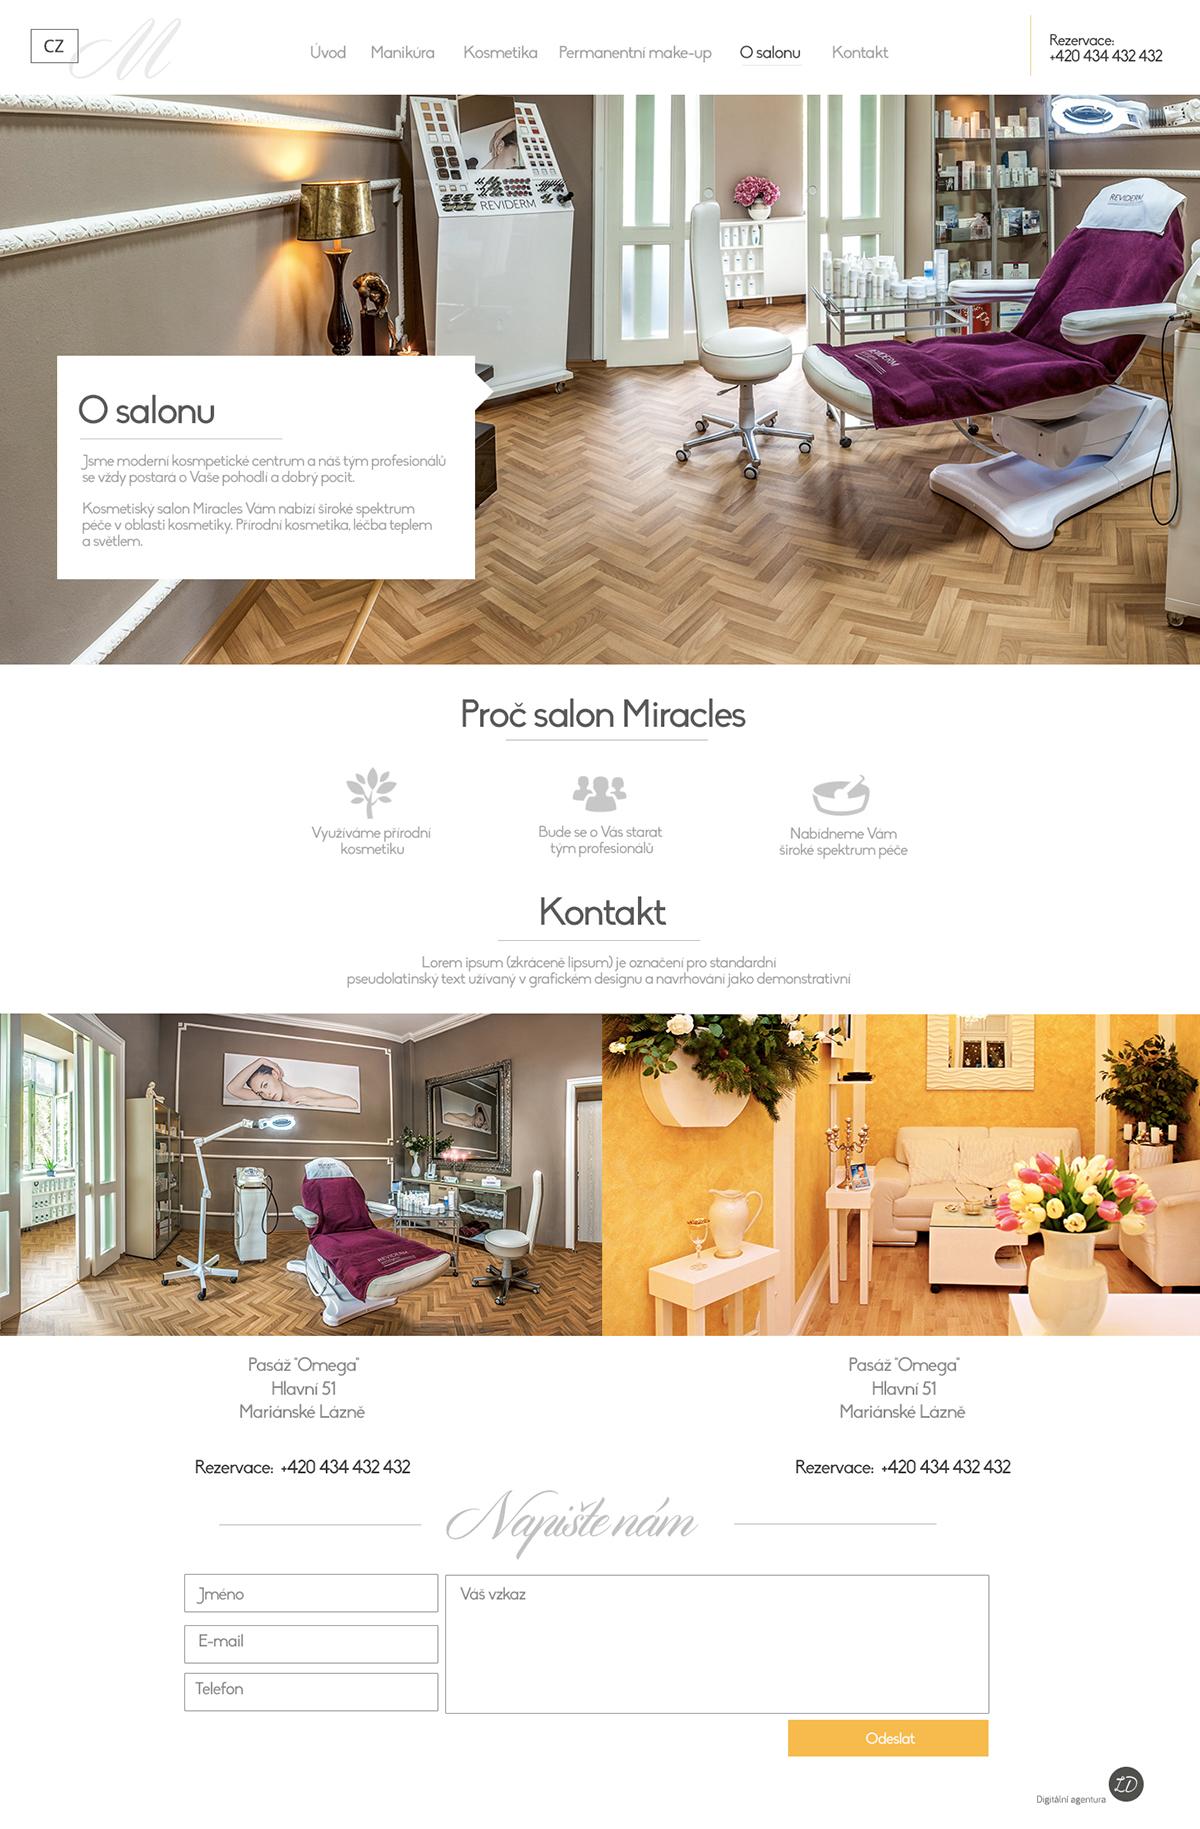 webdesgin UX design photoshop